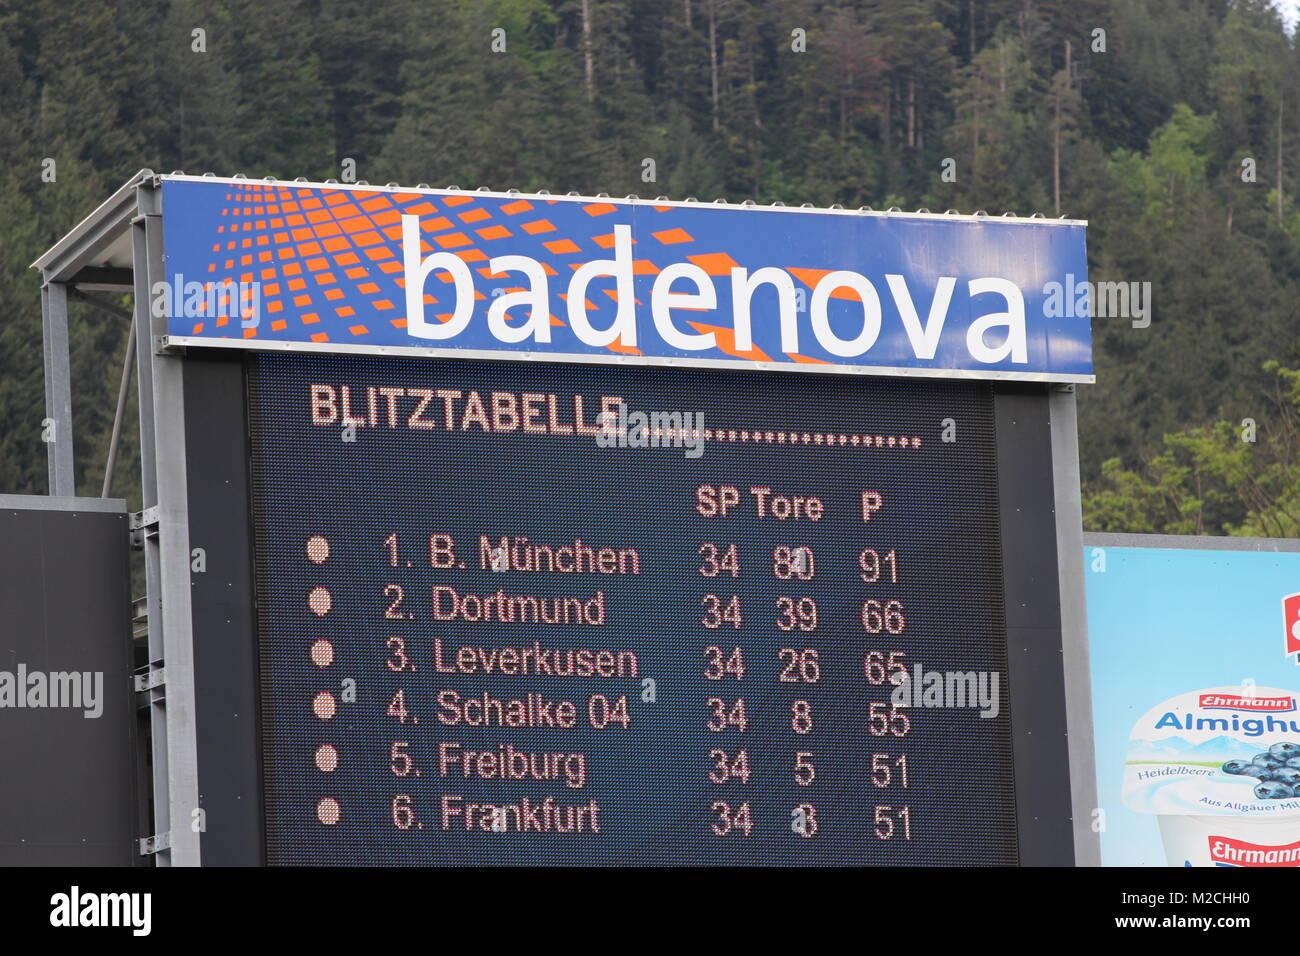 Fussball Bundesliga 34 Spieltag Sc Freiburg Vs Fc Schalke